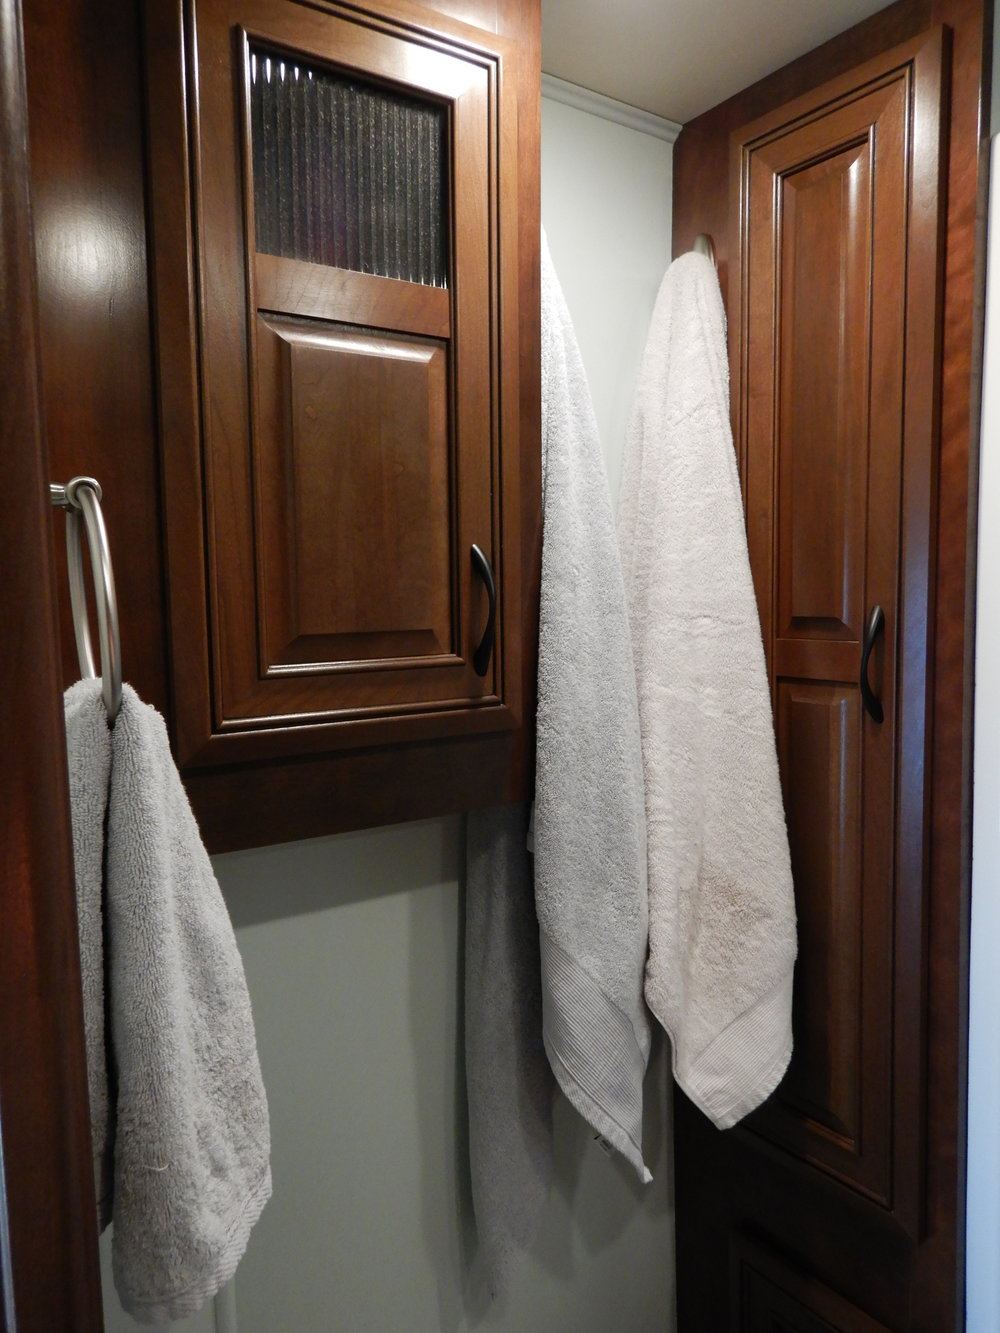 RV Bathroom Storage_After.JPG